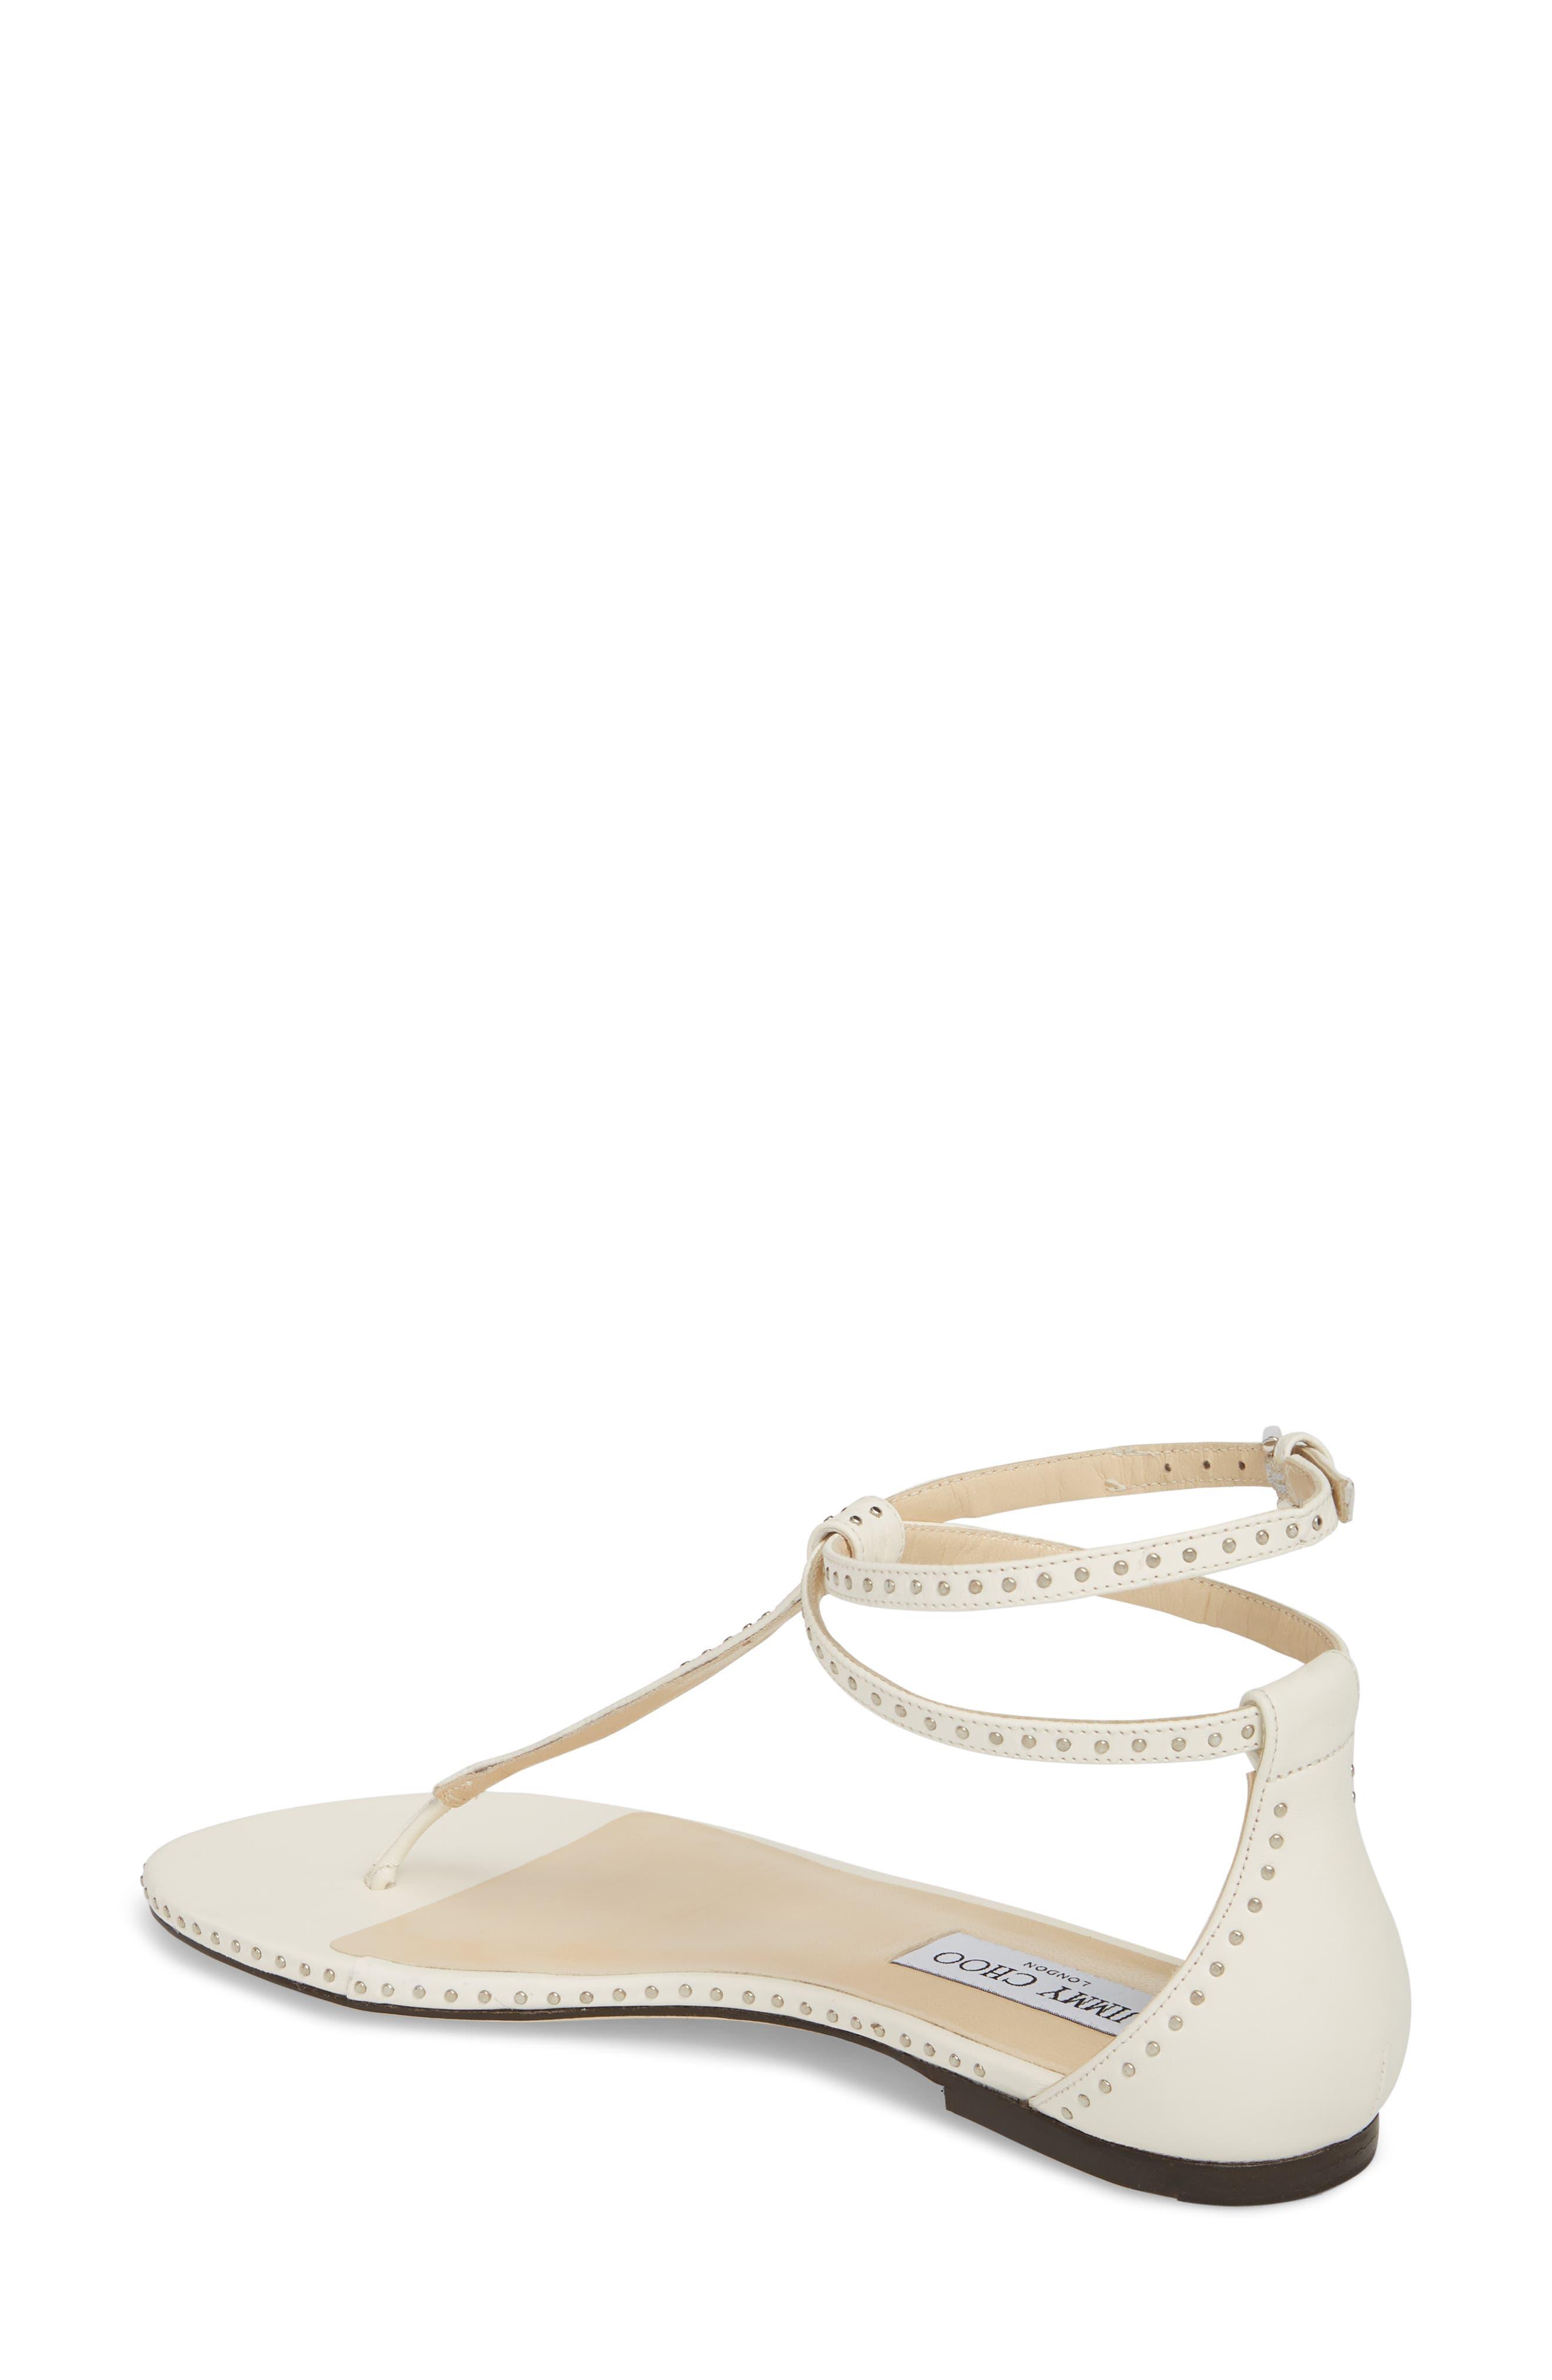 Afia Studded Leather Sandals - White Jimmy Choo London II8Xd